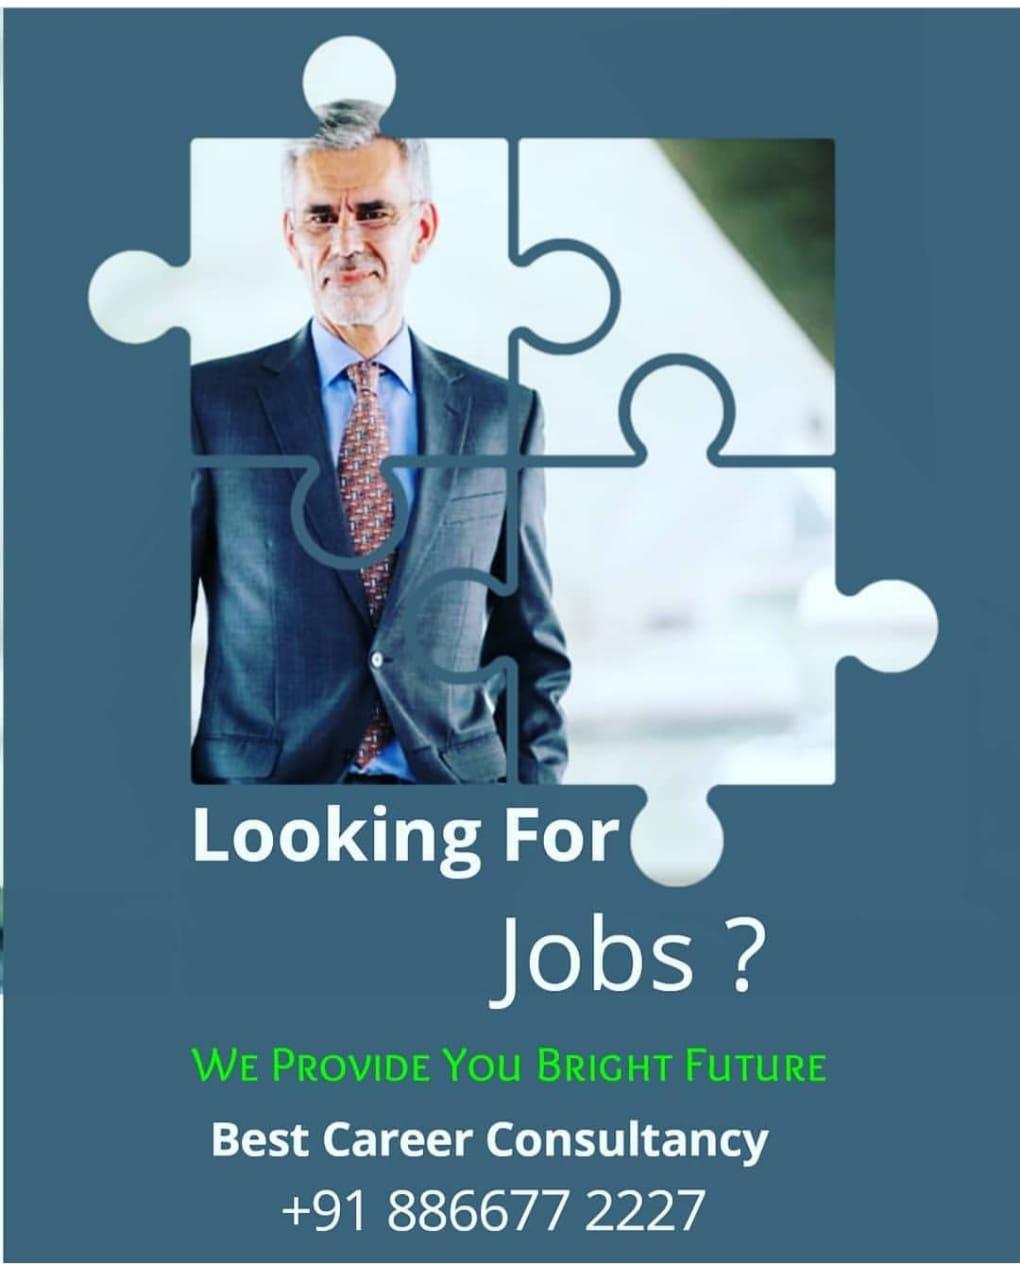 Best Career Consultancy